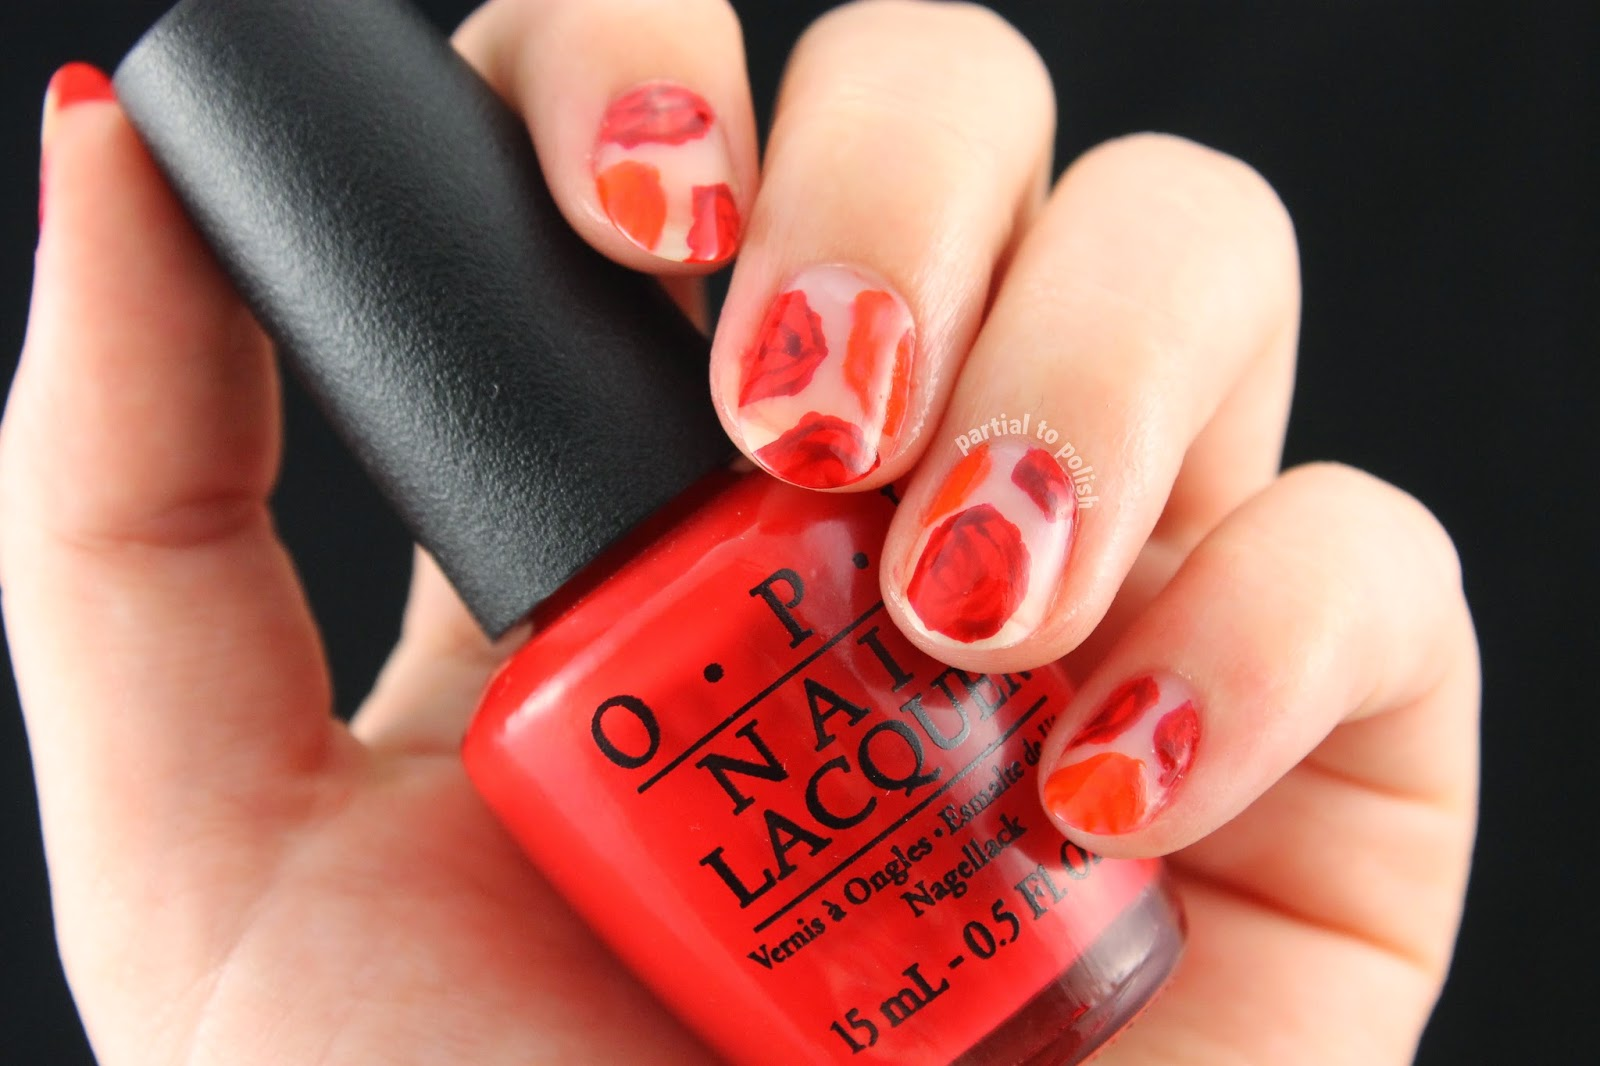 Orange and Red Negative Space Rose Nail Art Featuring Deborah Lippmann Nail Polish